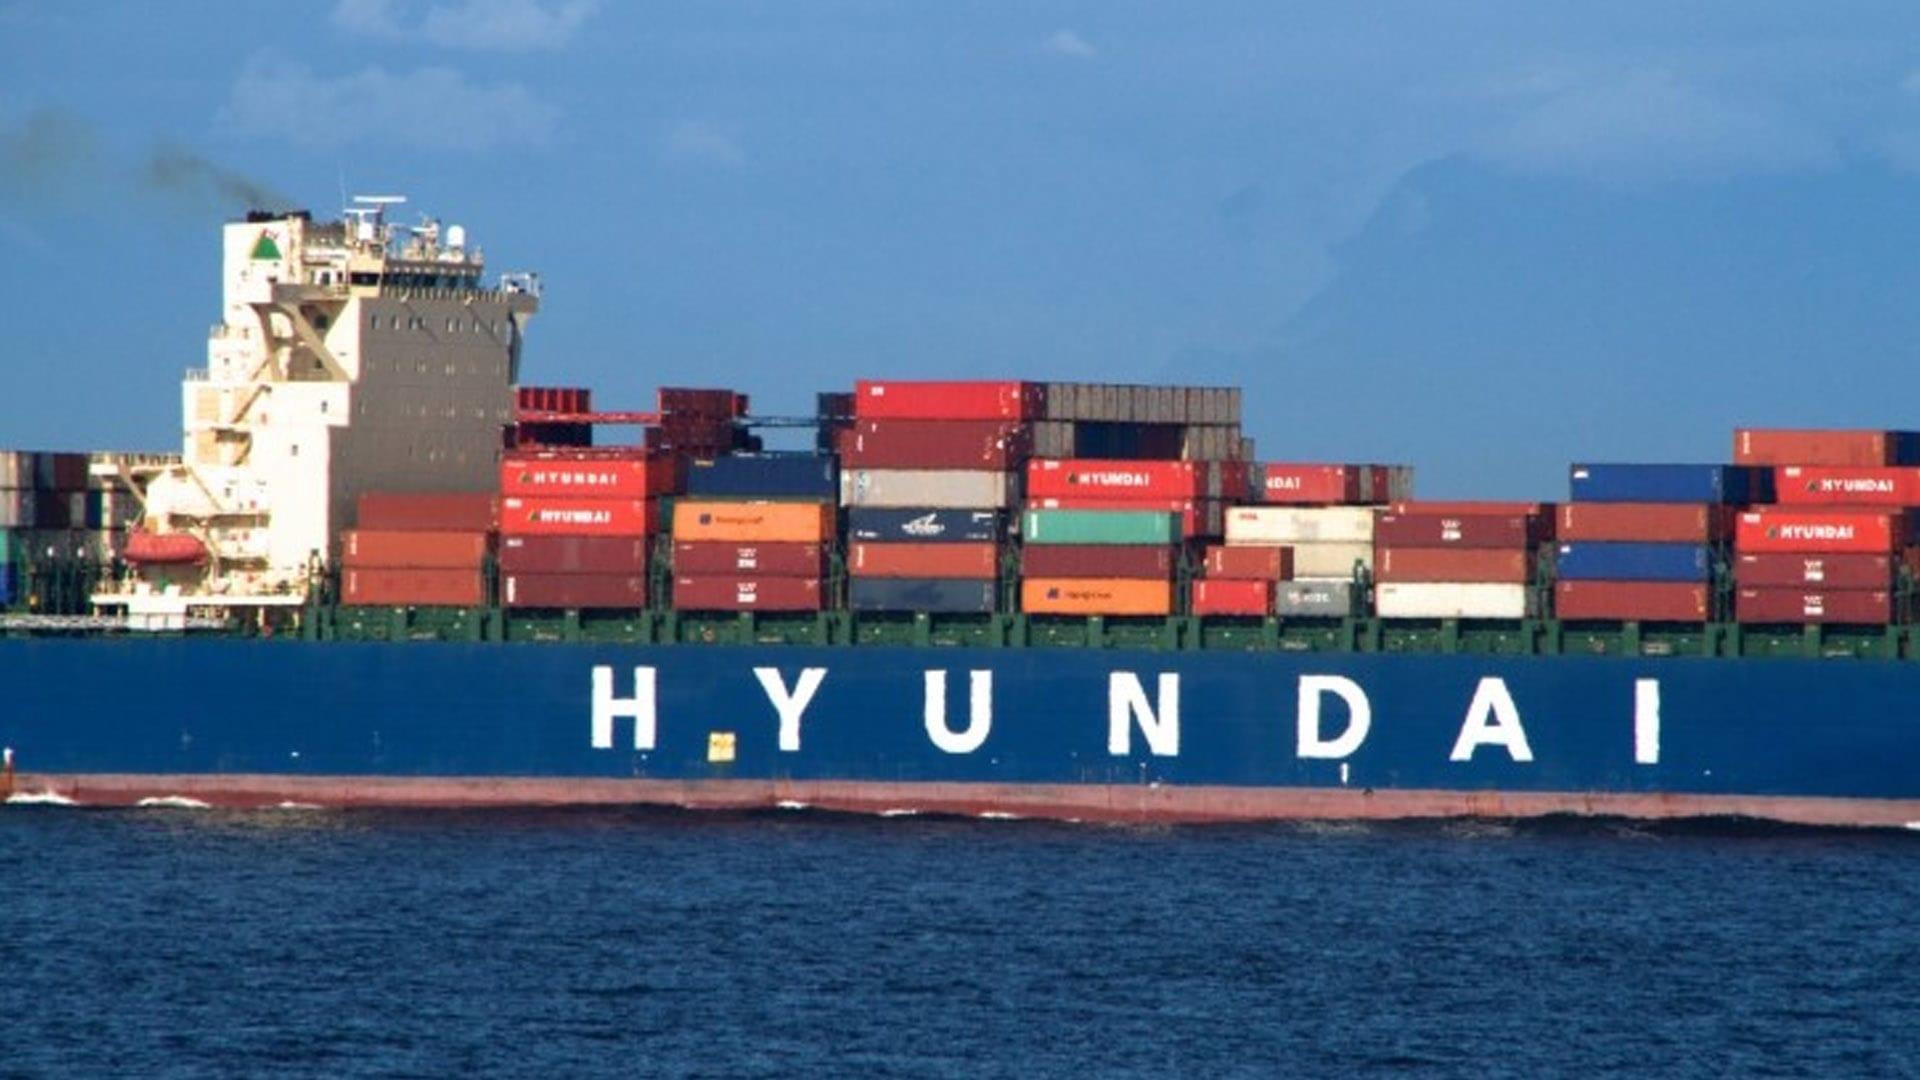 HMM's 24,000 TEU Mega Ships to Start Delivery in April